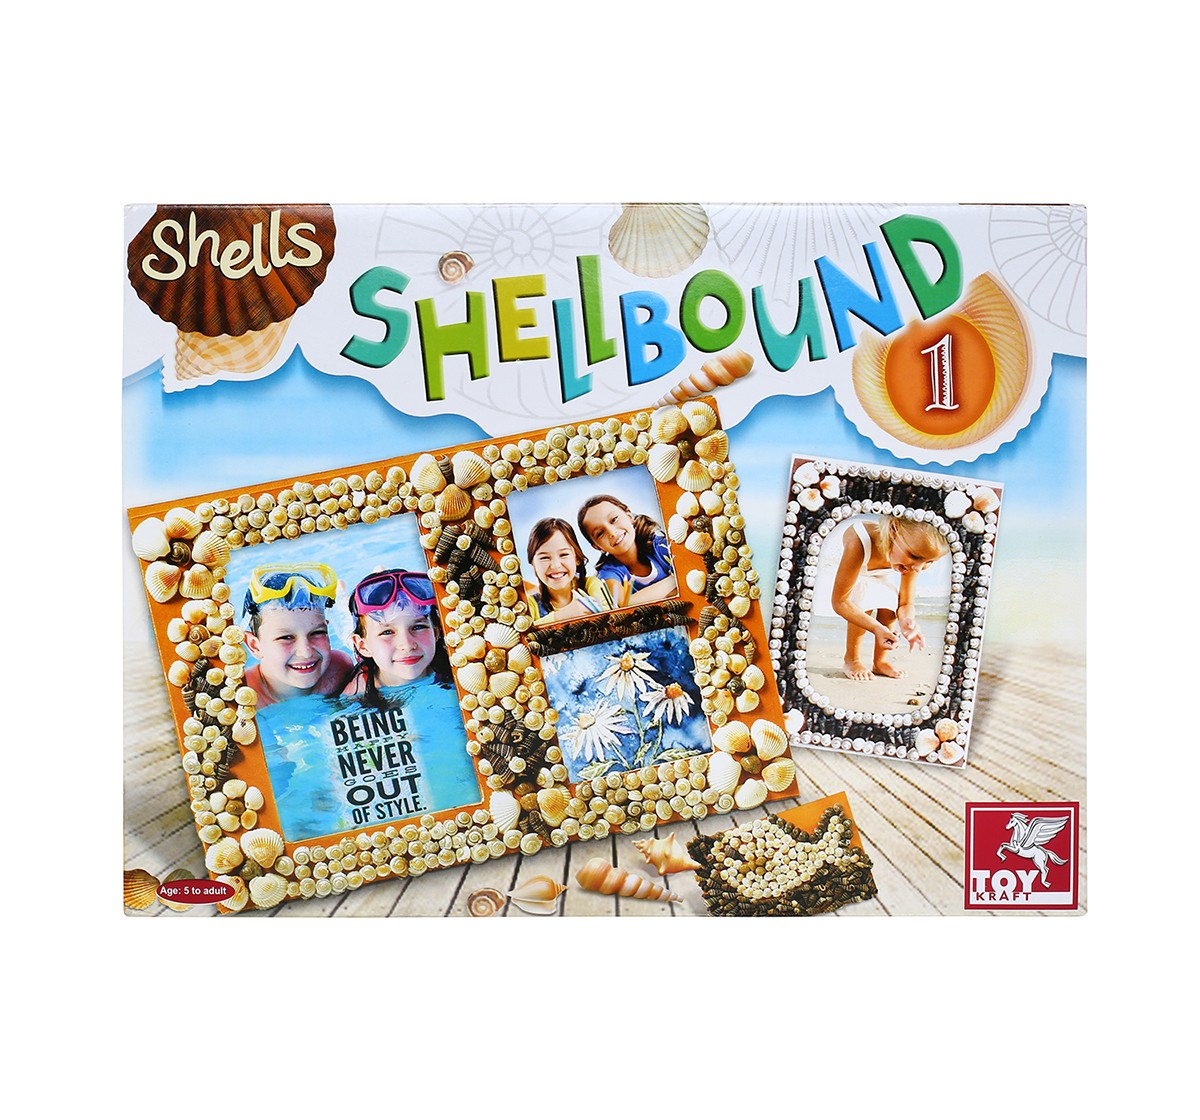 Toy Kraft Shellbound-1 DIY Art & Craft Kits for Kids age 5Y+